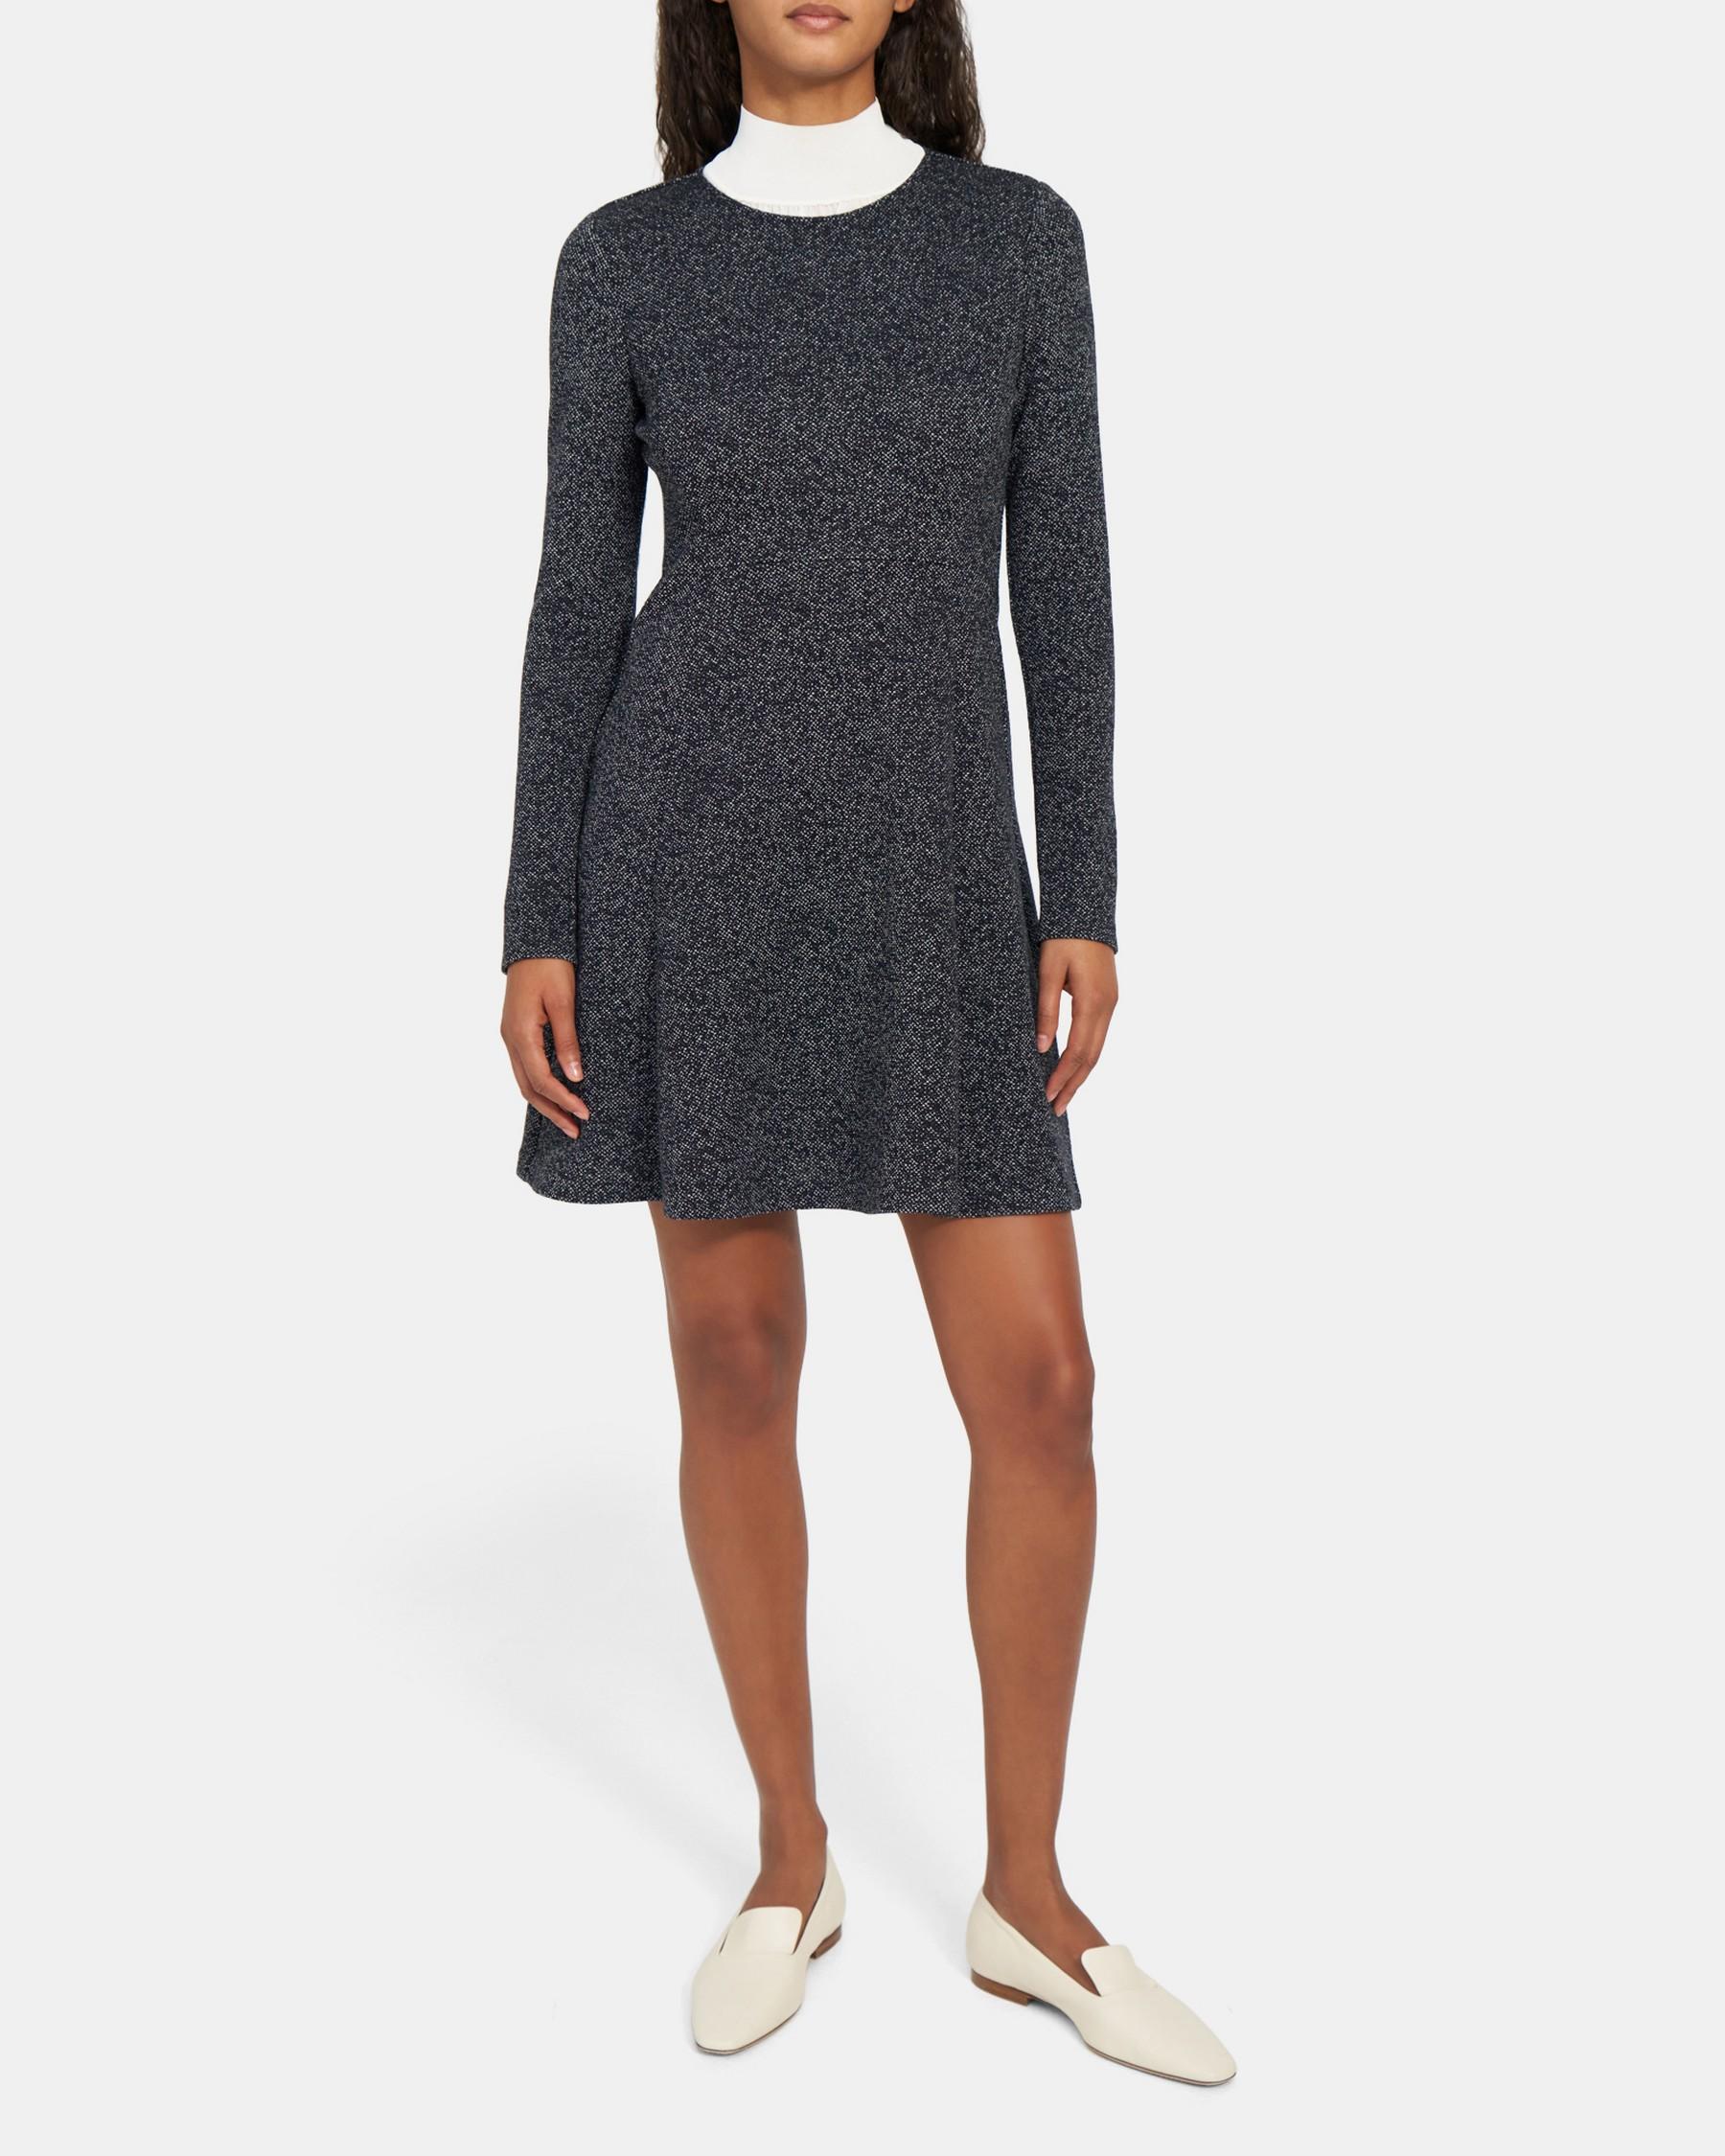 Albita Long-Sleeve Dress in Stretch Knit   Theory